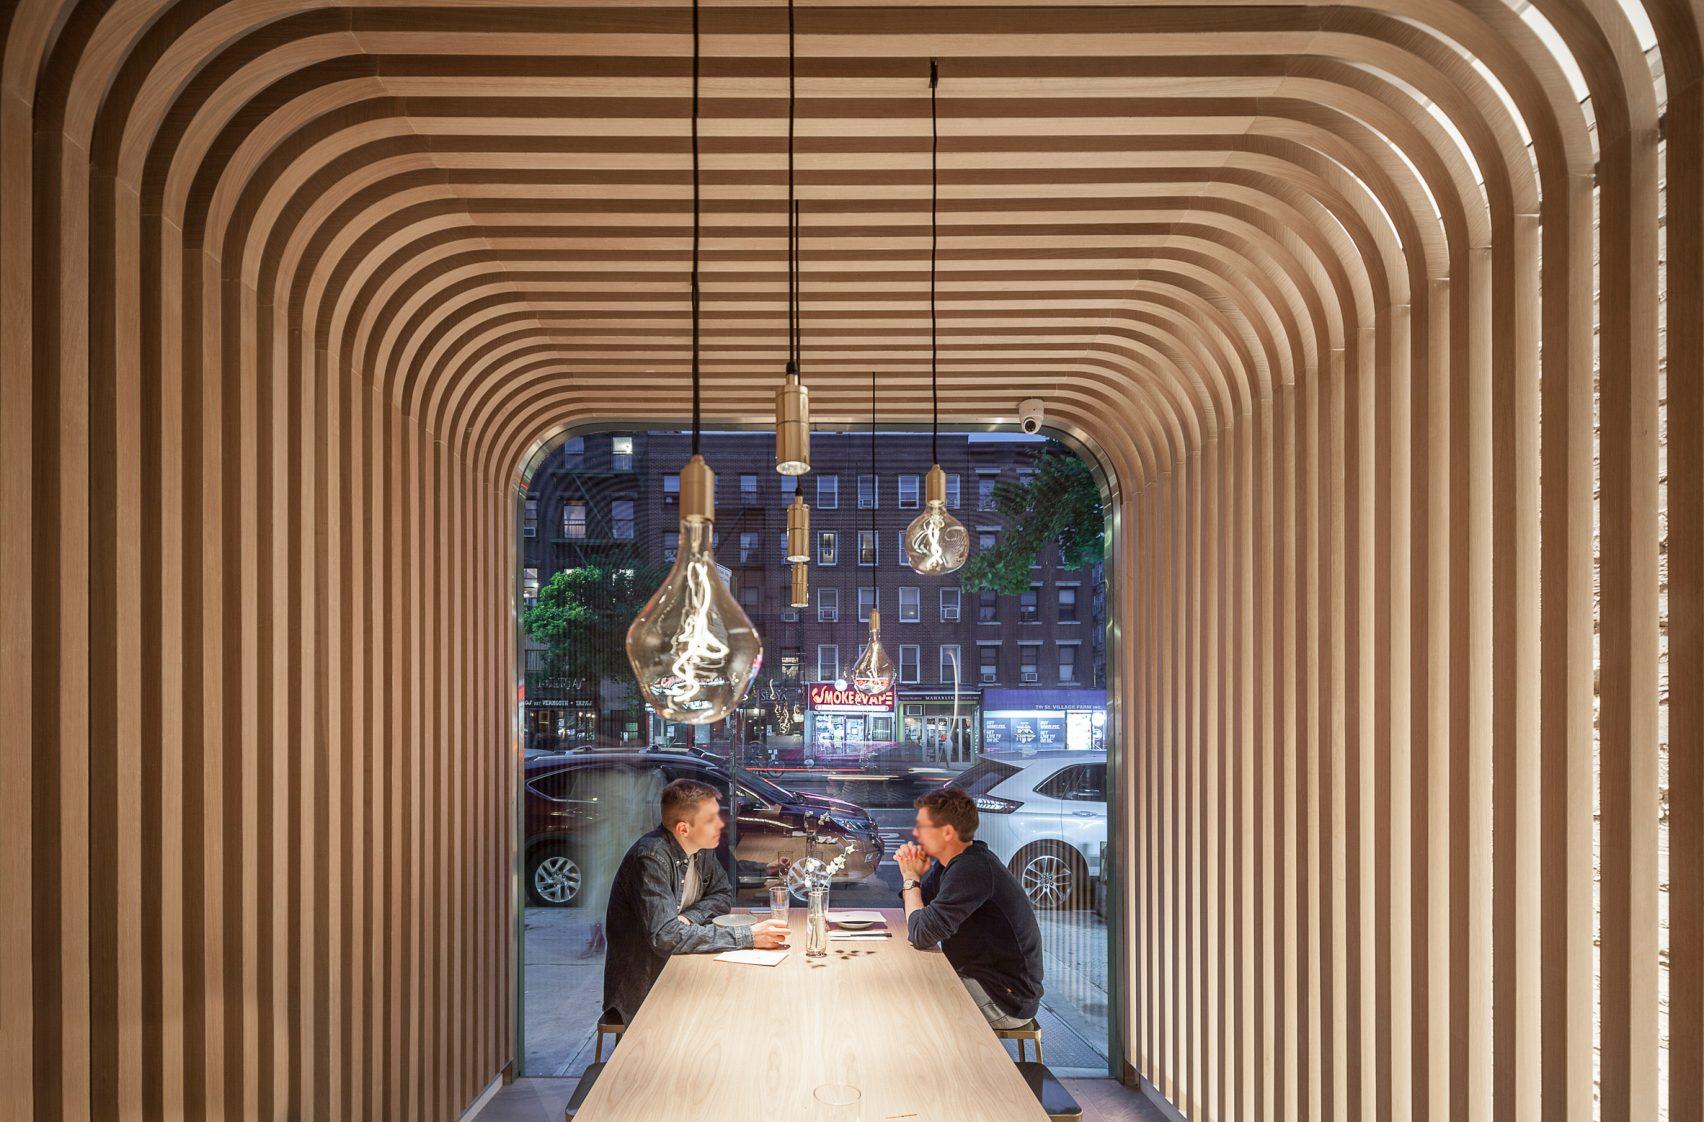 trend archi: Hunan Slurp, ristorante cinese, Manhattan